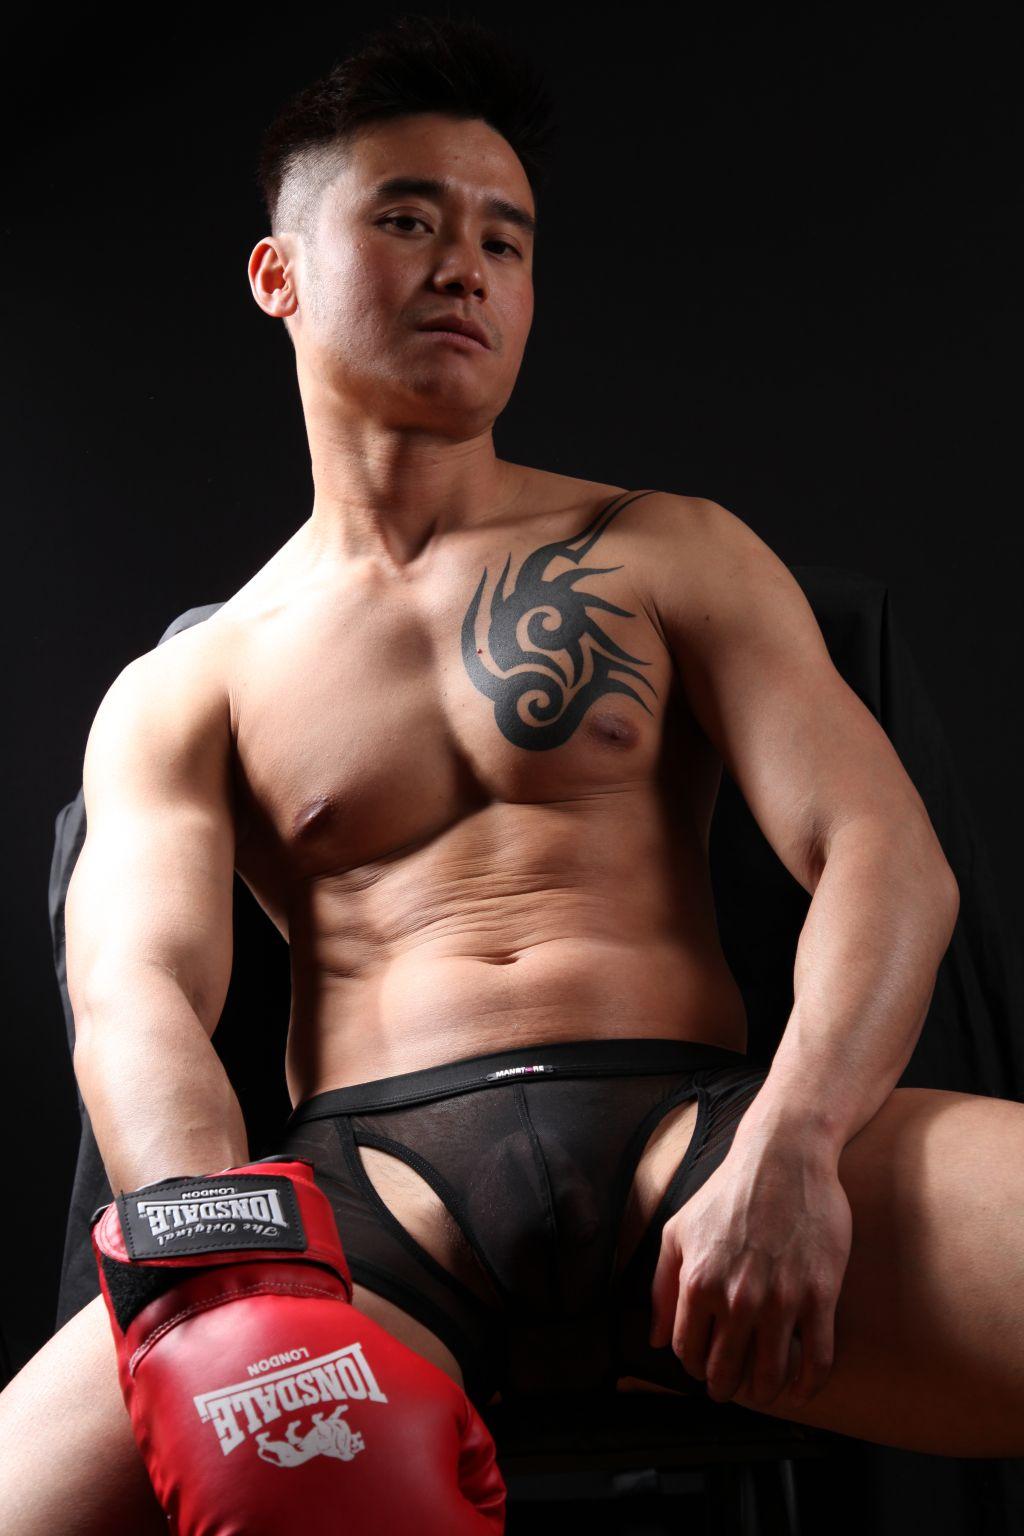 ... mga 6ft malakas ang sex appeal , half sya d ko alm kung anung lahi basta ...